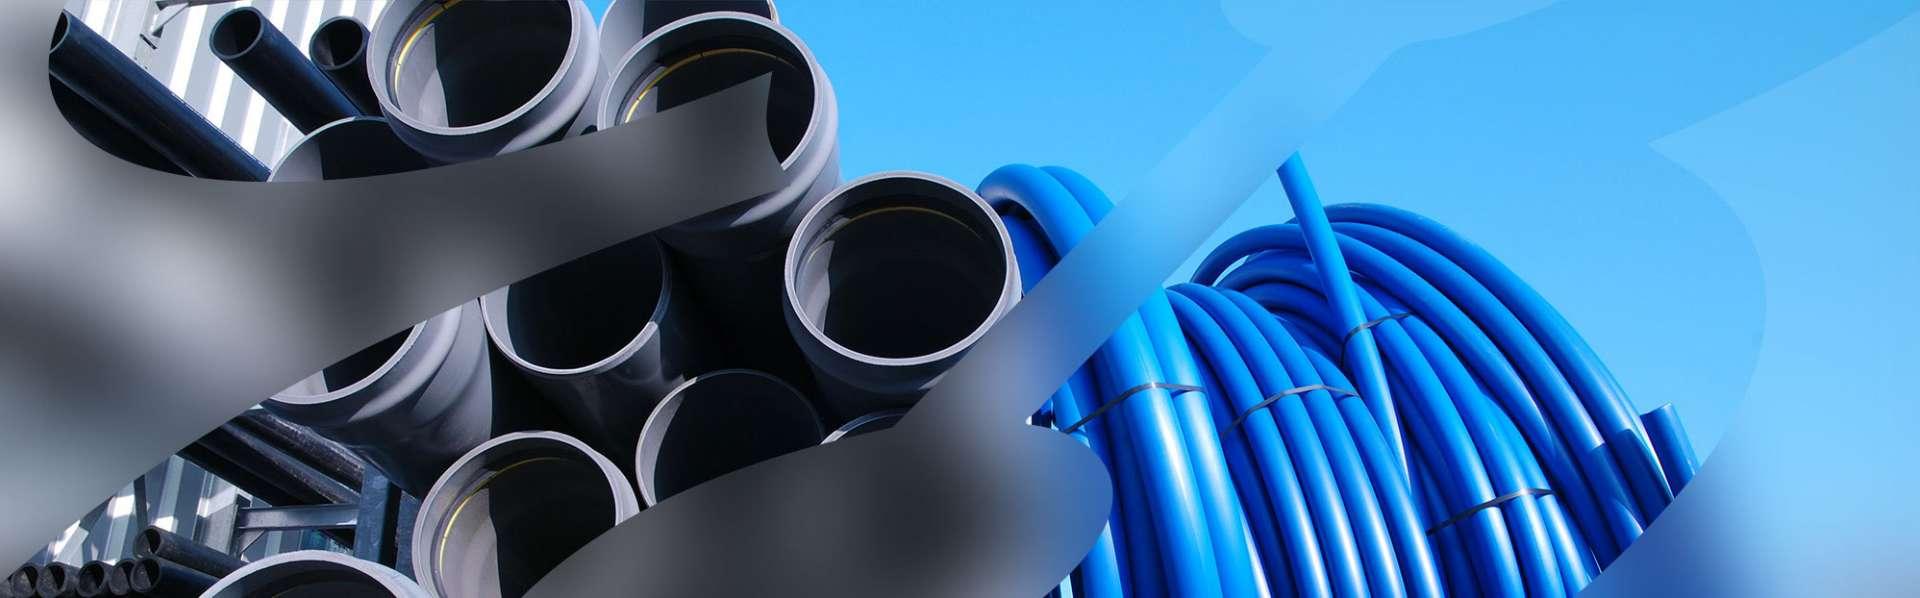 Construction / Building Industry - Materials